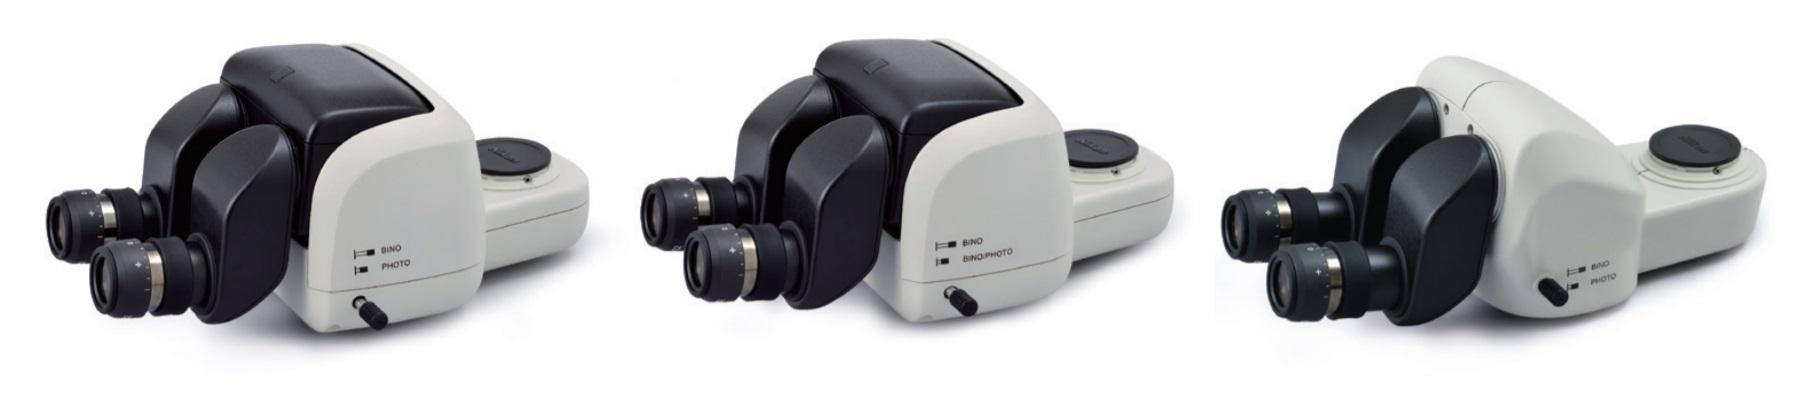 Тубусы для стереомикроскопа